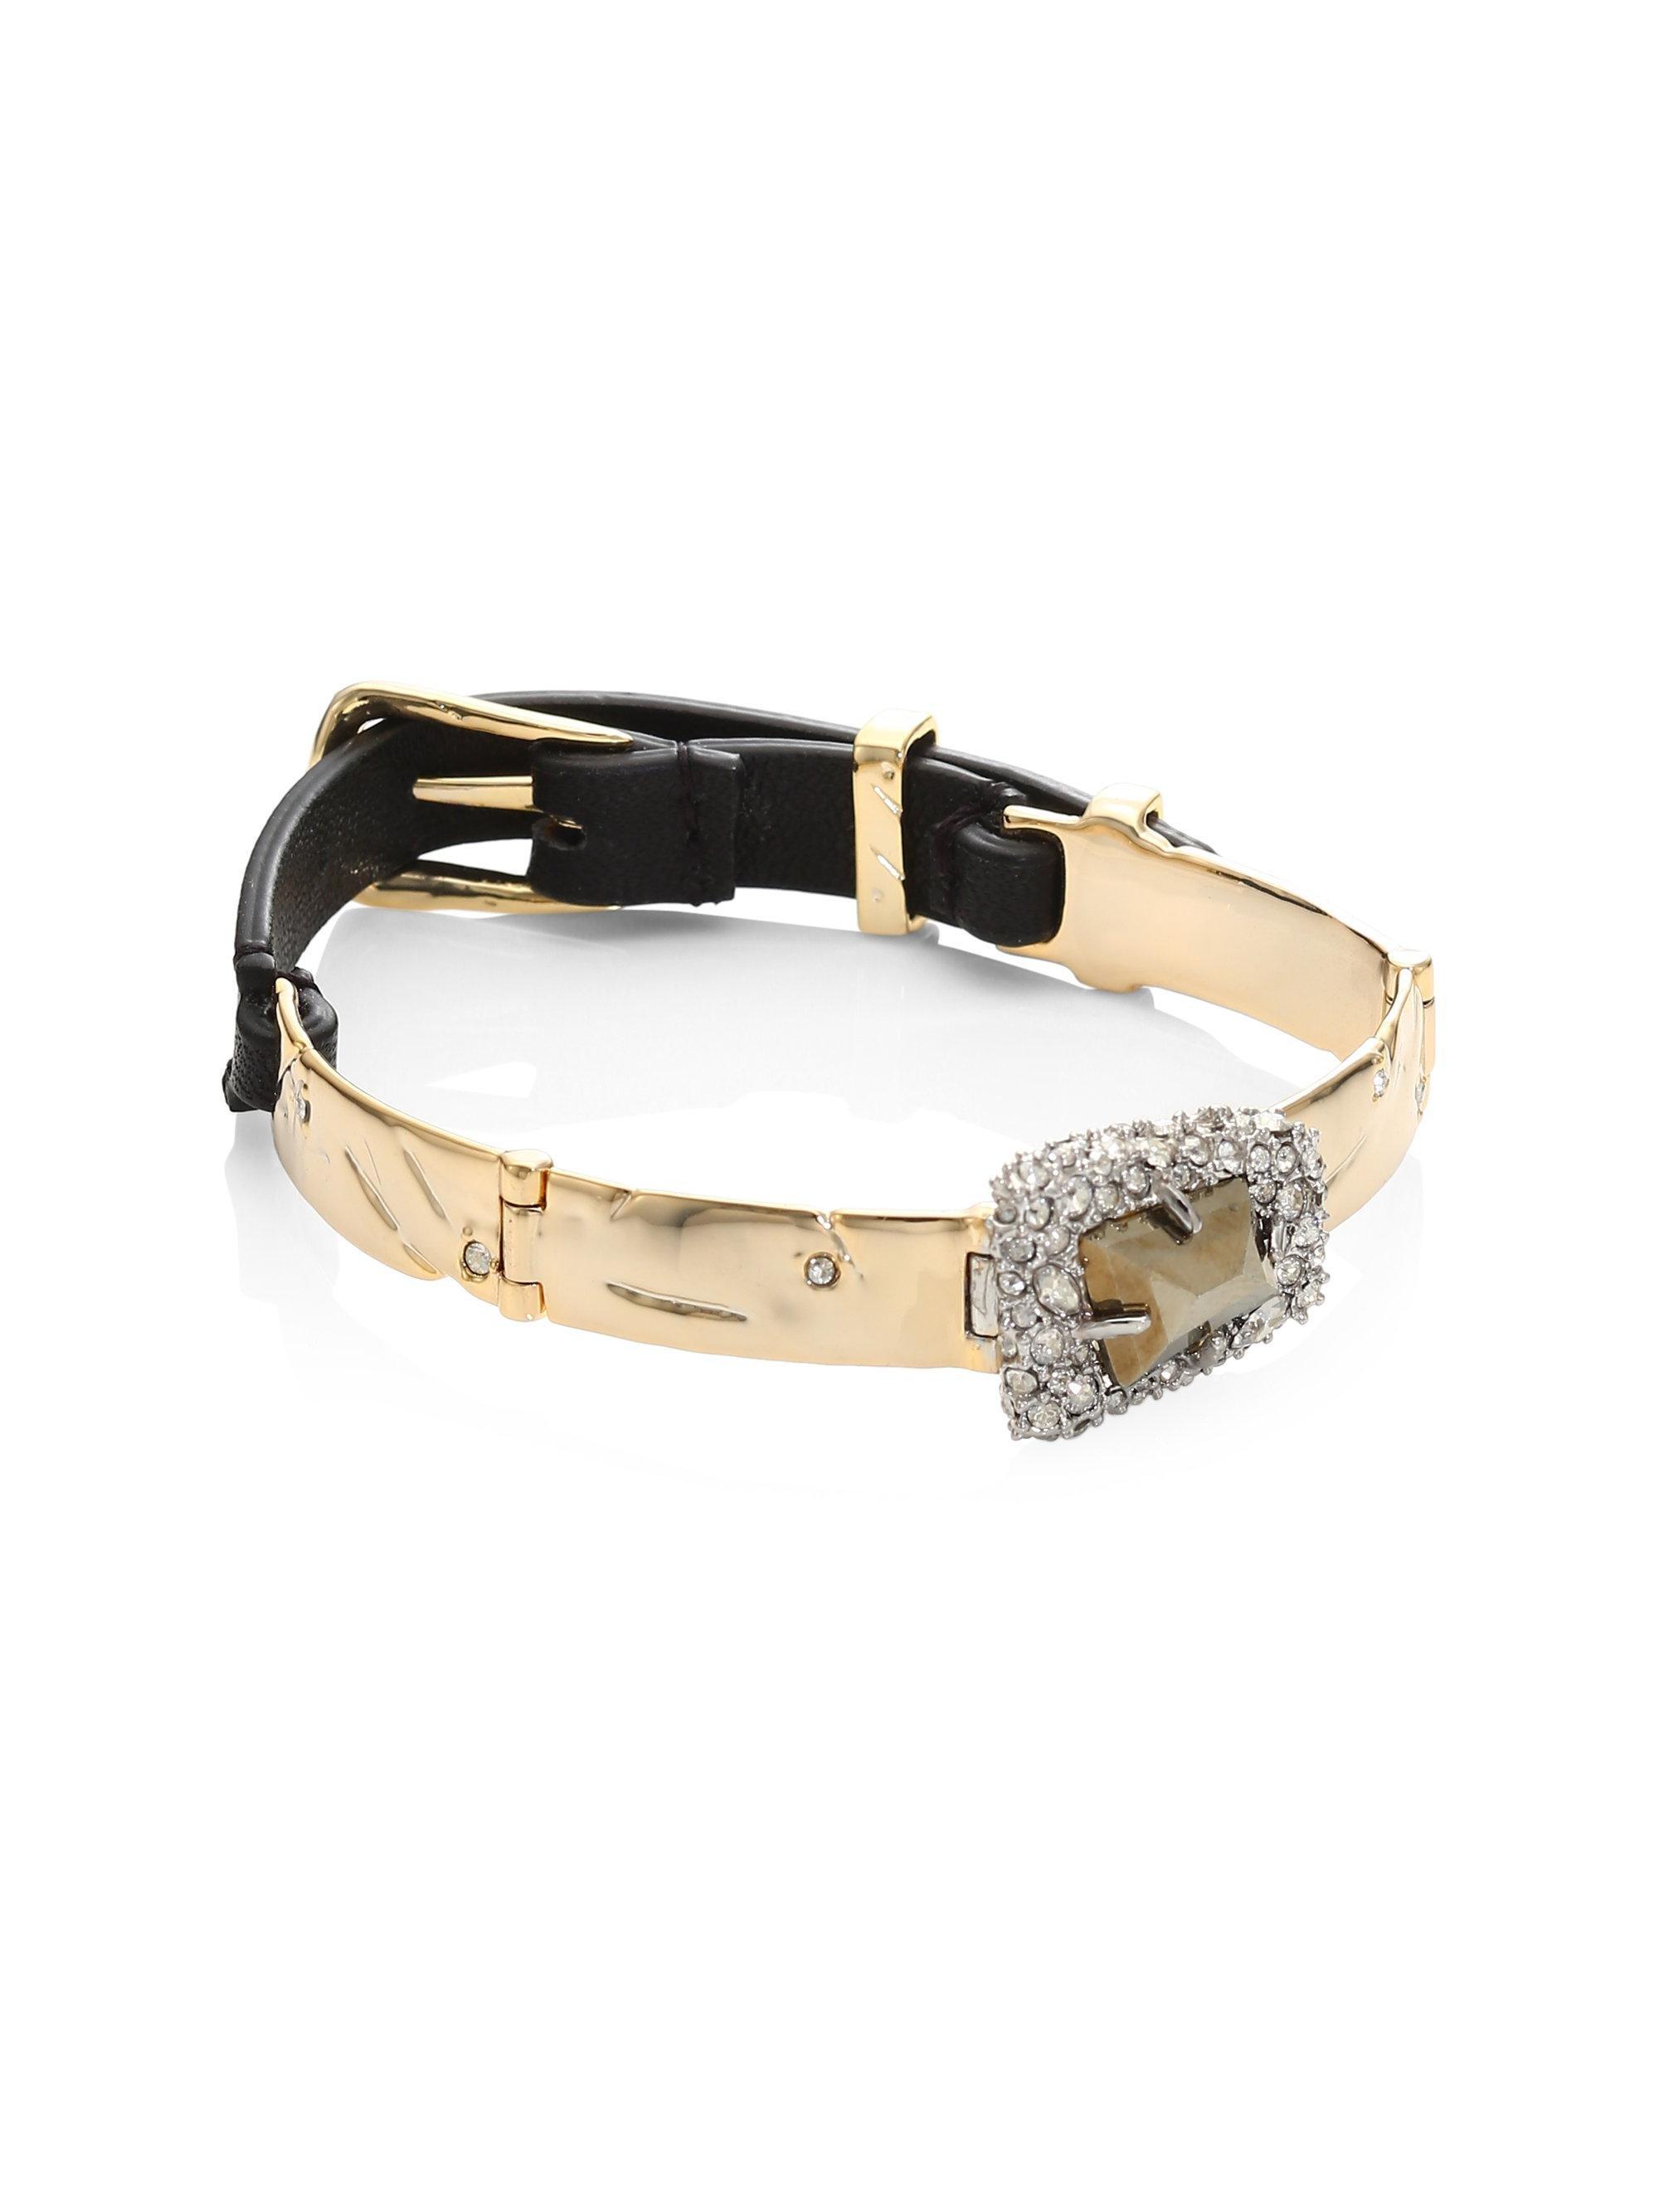 Alexis Bittar Multi-Station Leather Bracelet 0uUrdCmtT